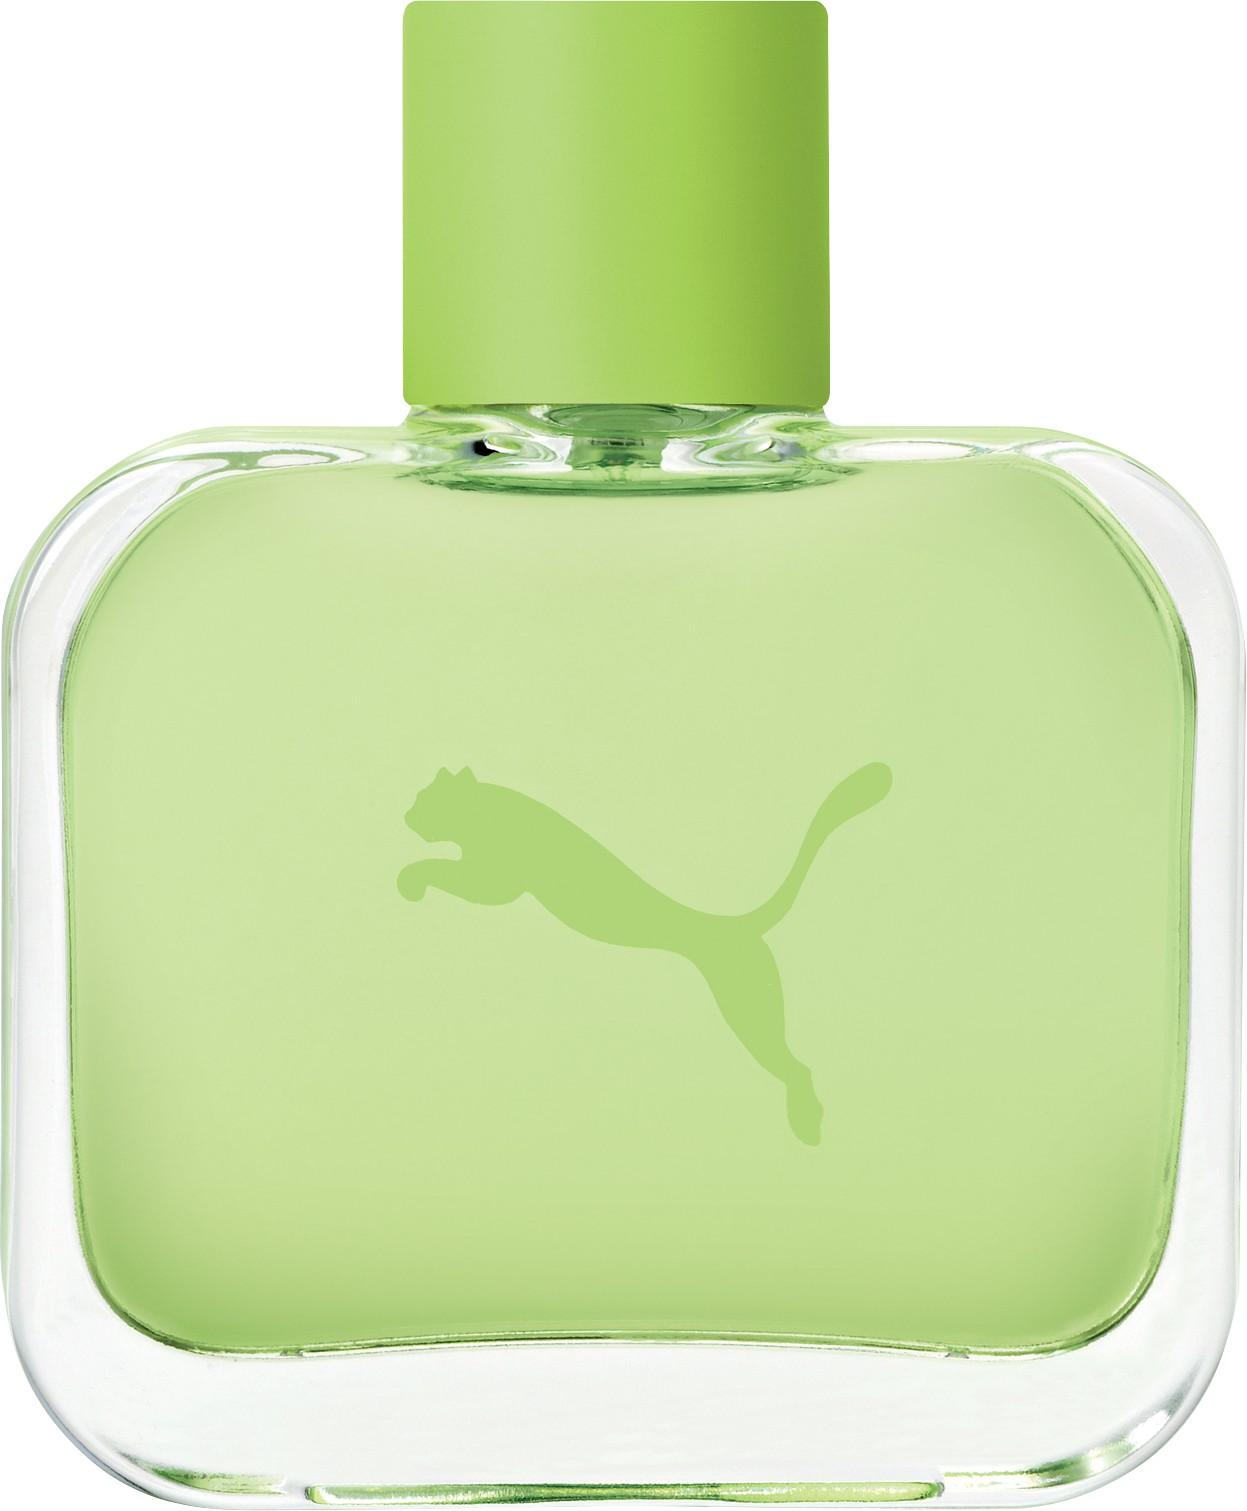 Puma Green Man аромат для мужчин